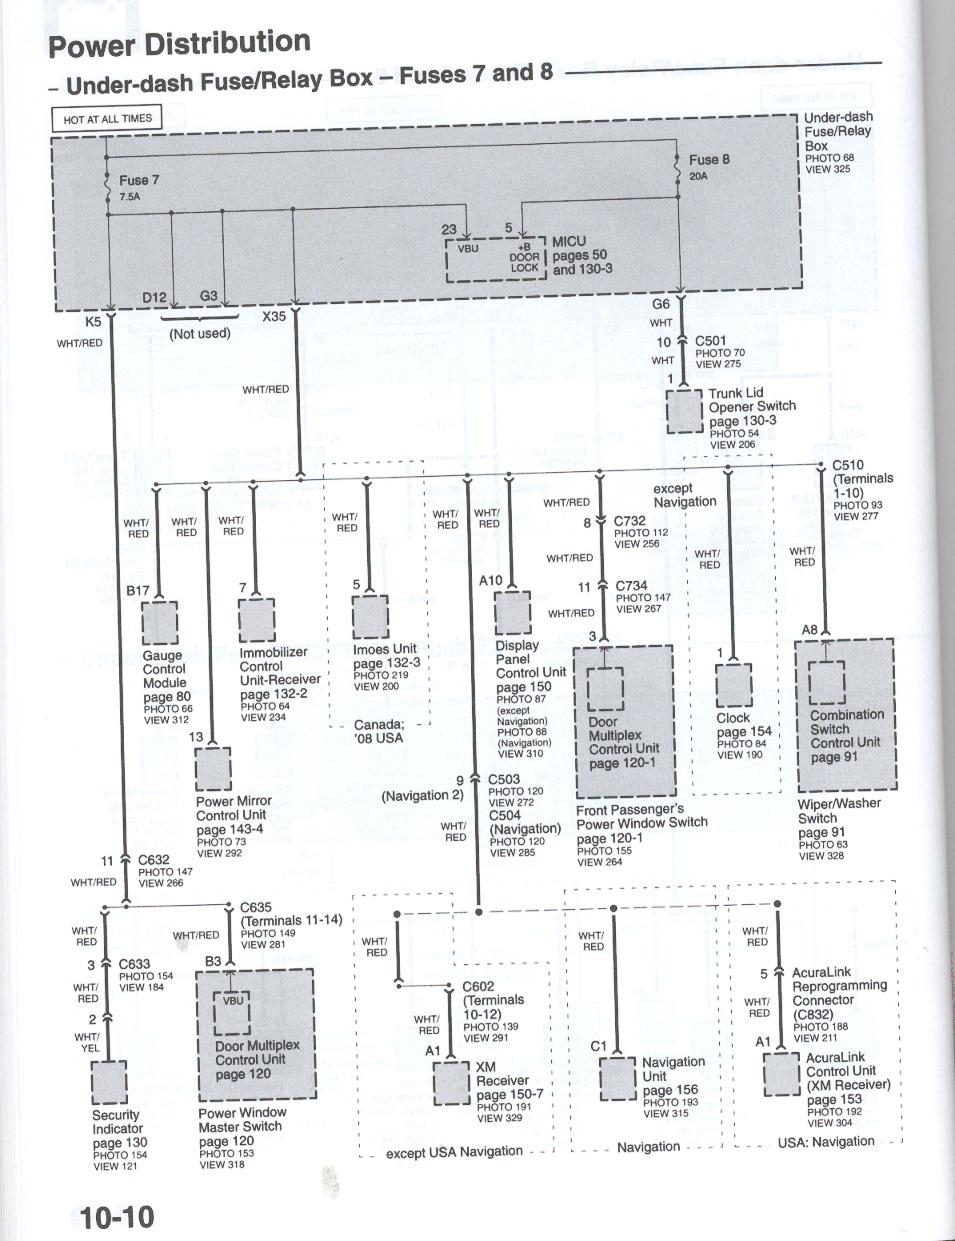 hight resolution of 1997 acura slx fuse box location wiring library 2004 acura mdx fuse box location 1997 acura slx fuse box location